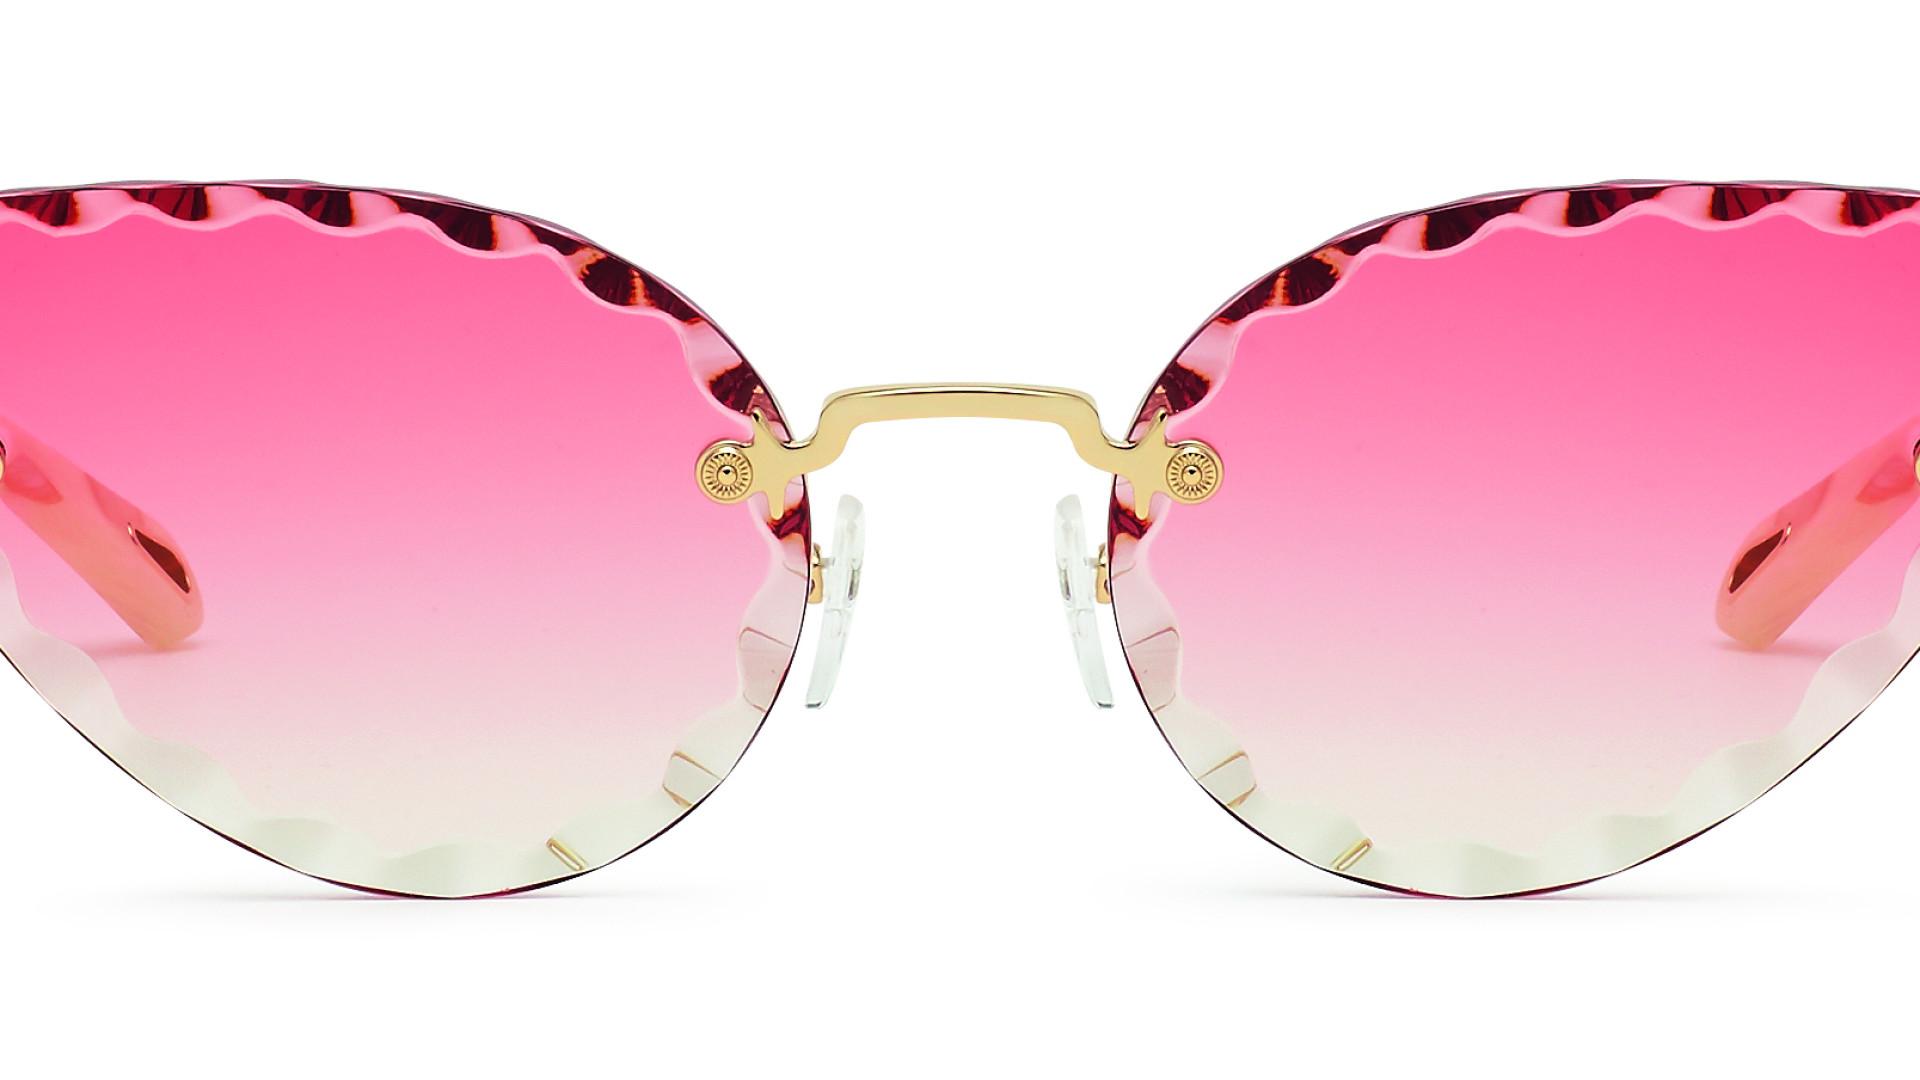 6fcf85529 Óculos de sol: A Chloé apresenta os novos modelos Rosie